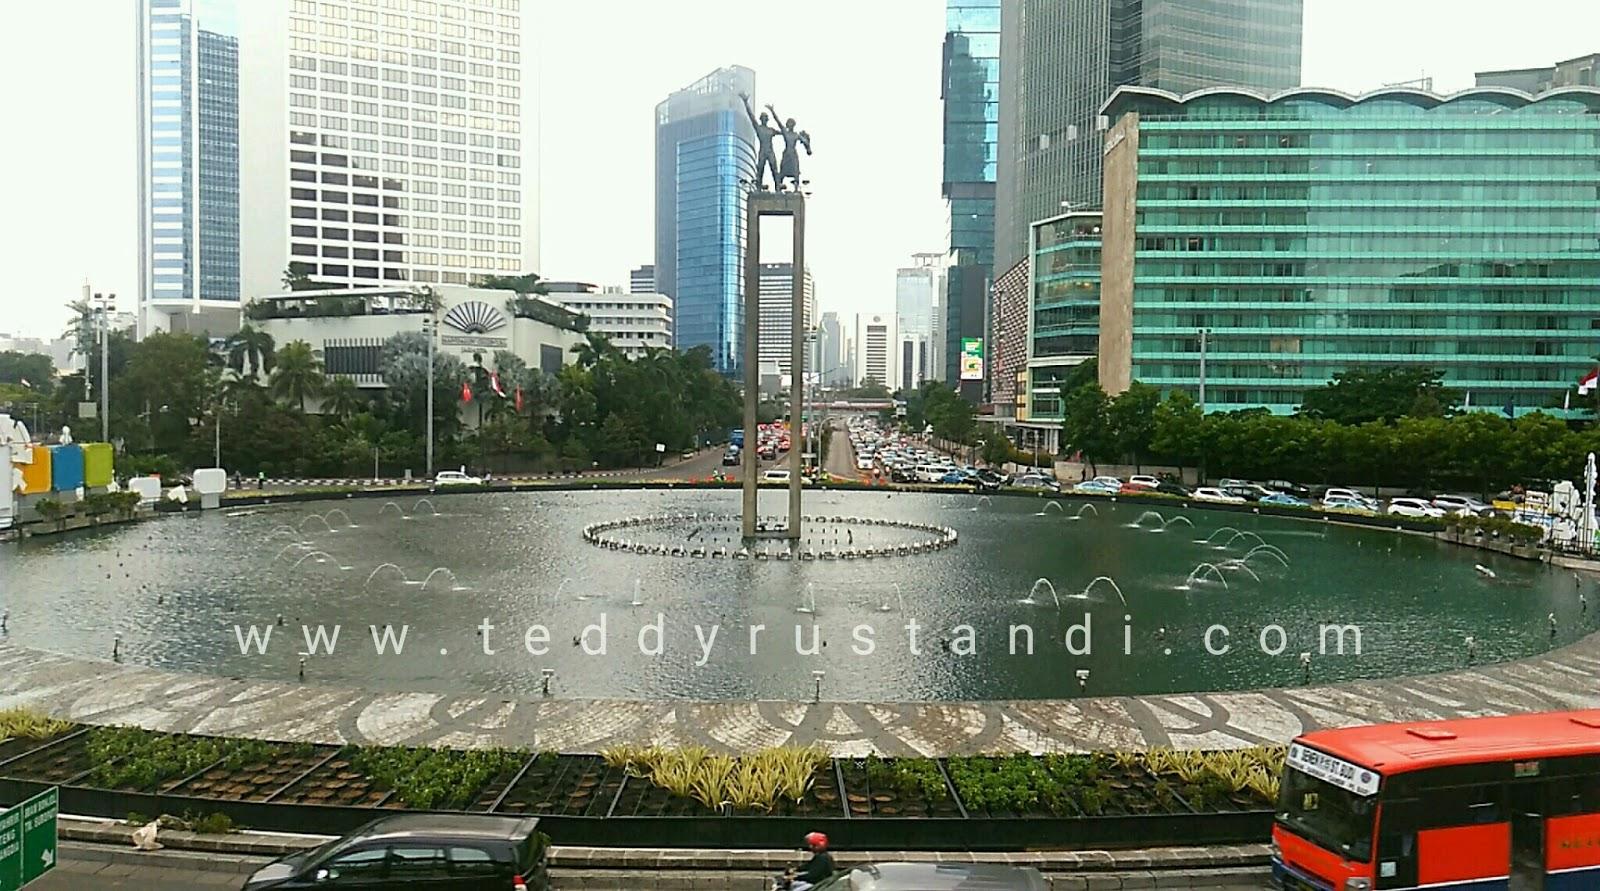 Blusukan Ke Stasiun Bawah Tanah Bundaran Hi Mrt Jakarta Catatan